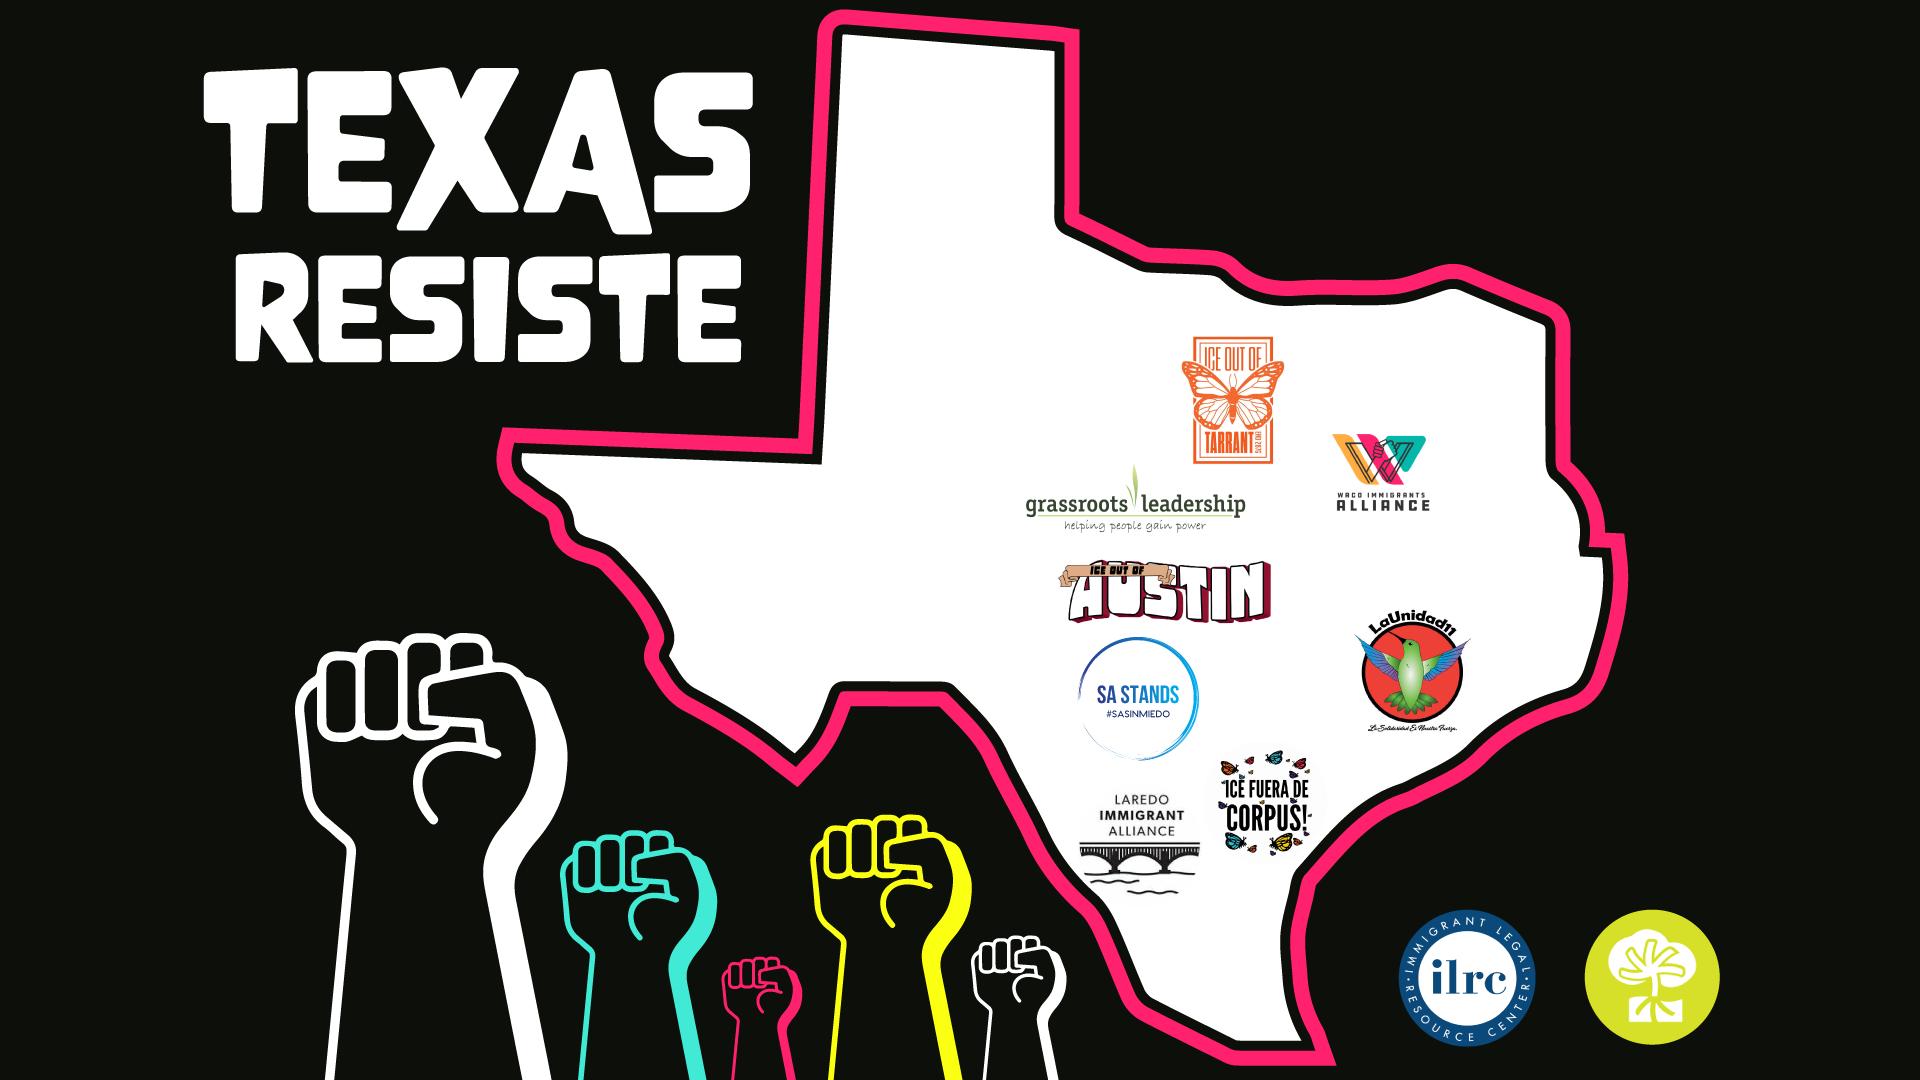 tx-resists-map.png